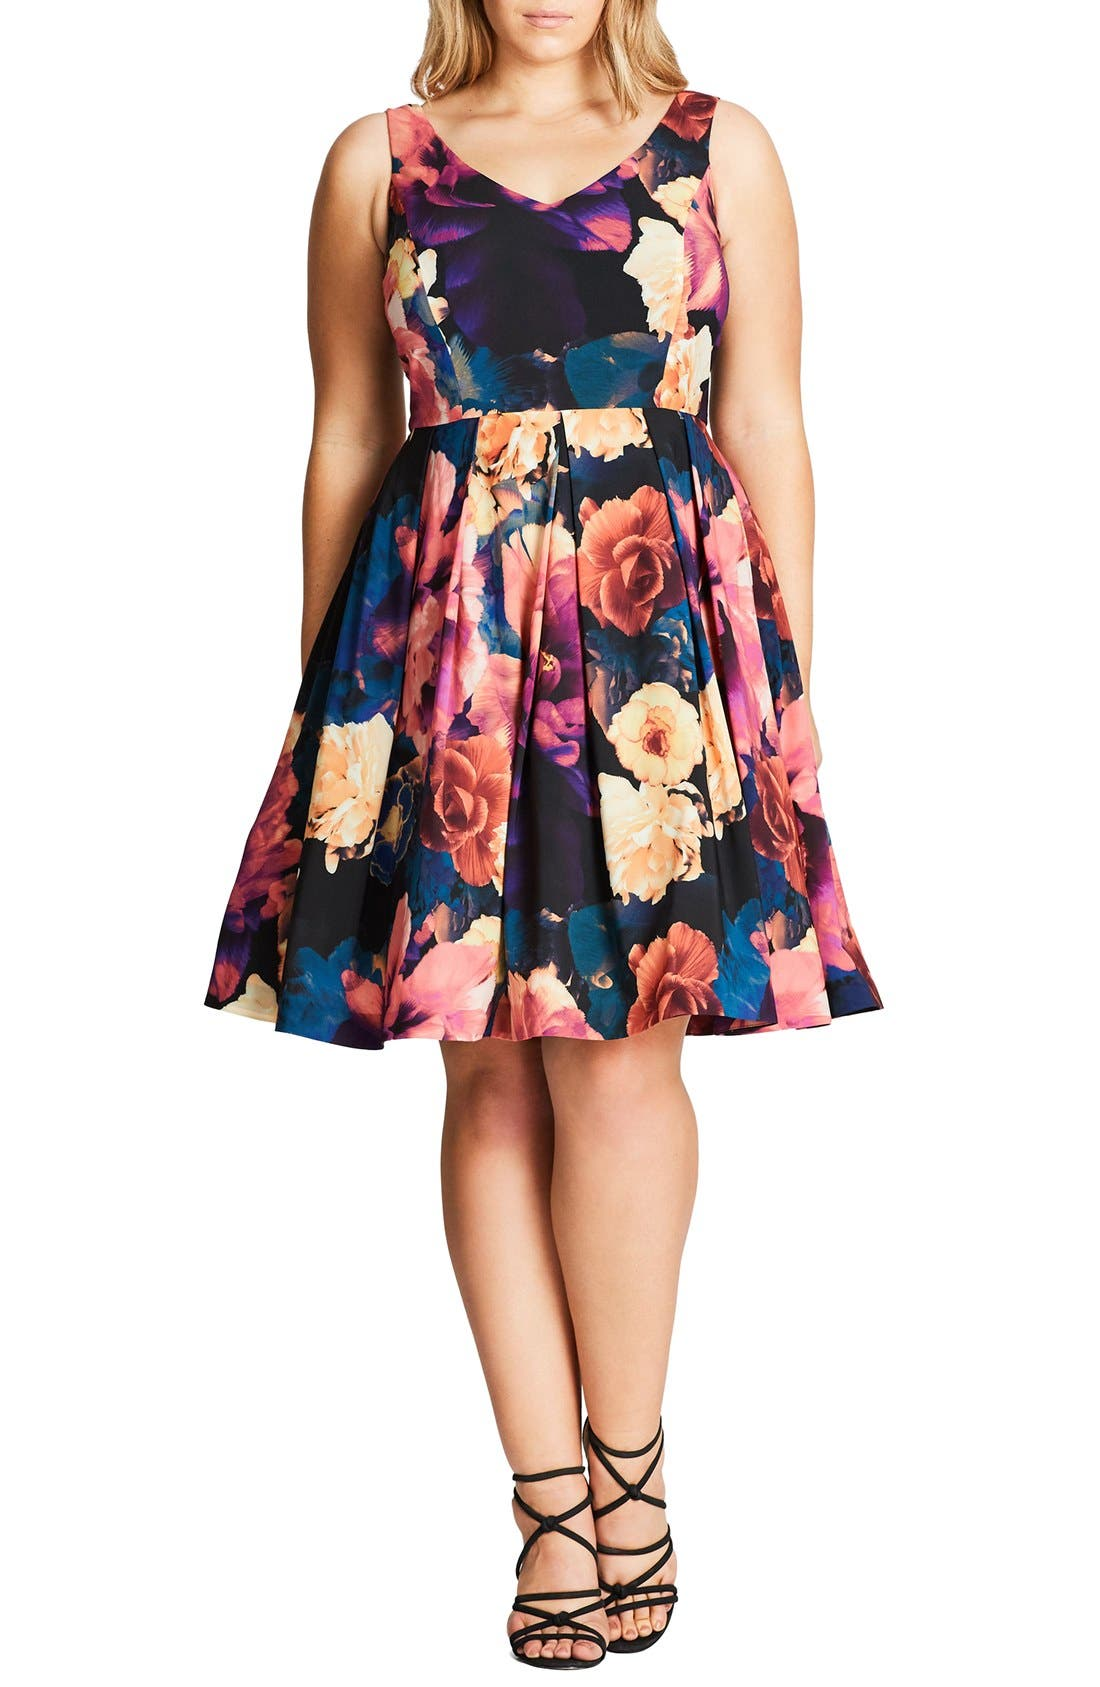 Alternate Image 1 Selected - City Chic Secret Garden Print Fit & Flare Dress (Plus Size)